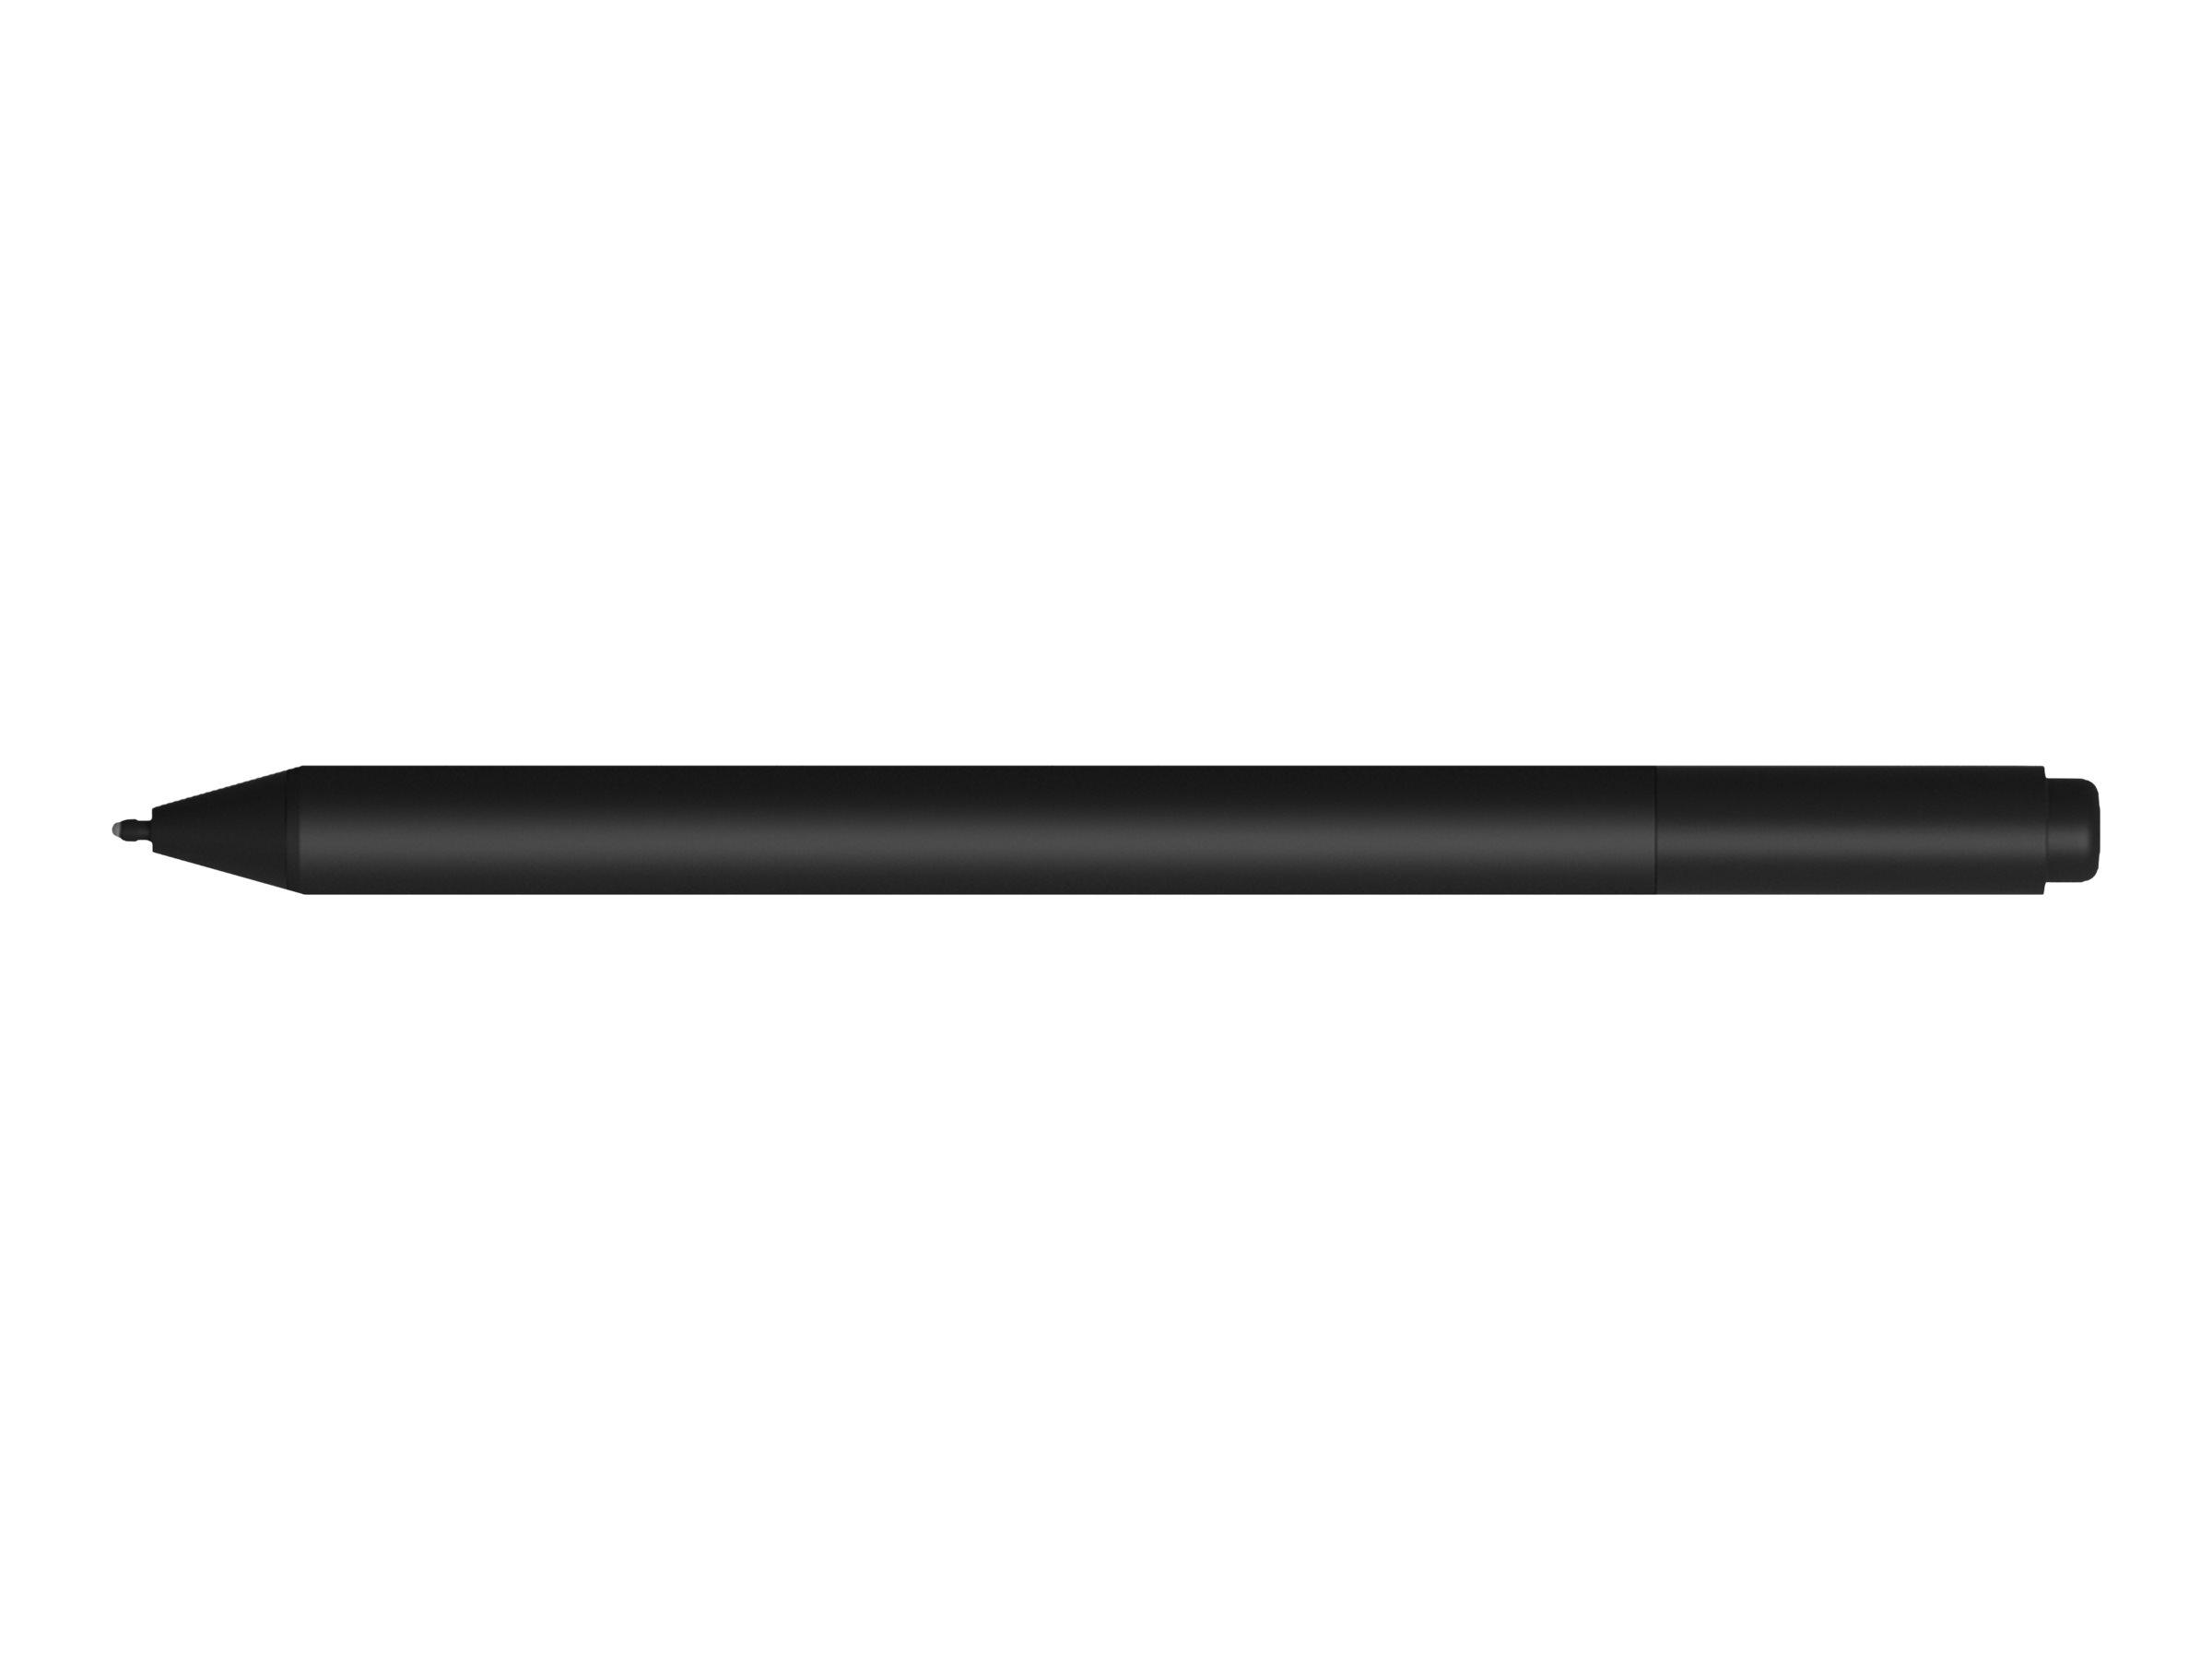 Microsoft Surface Pen M1776 - stylus - Bluetooth 4.0 - black